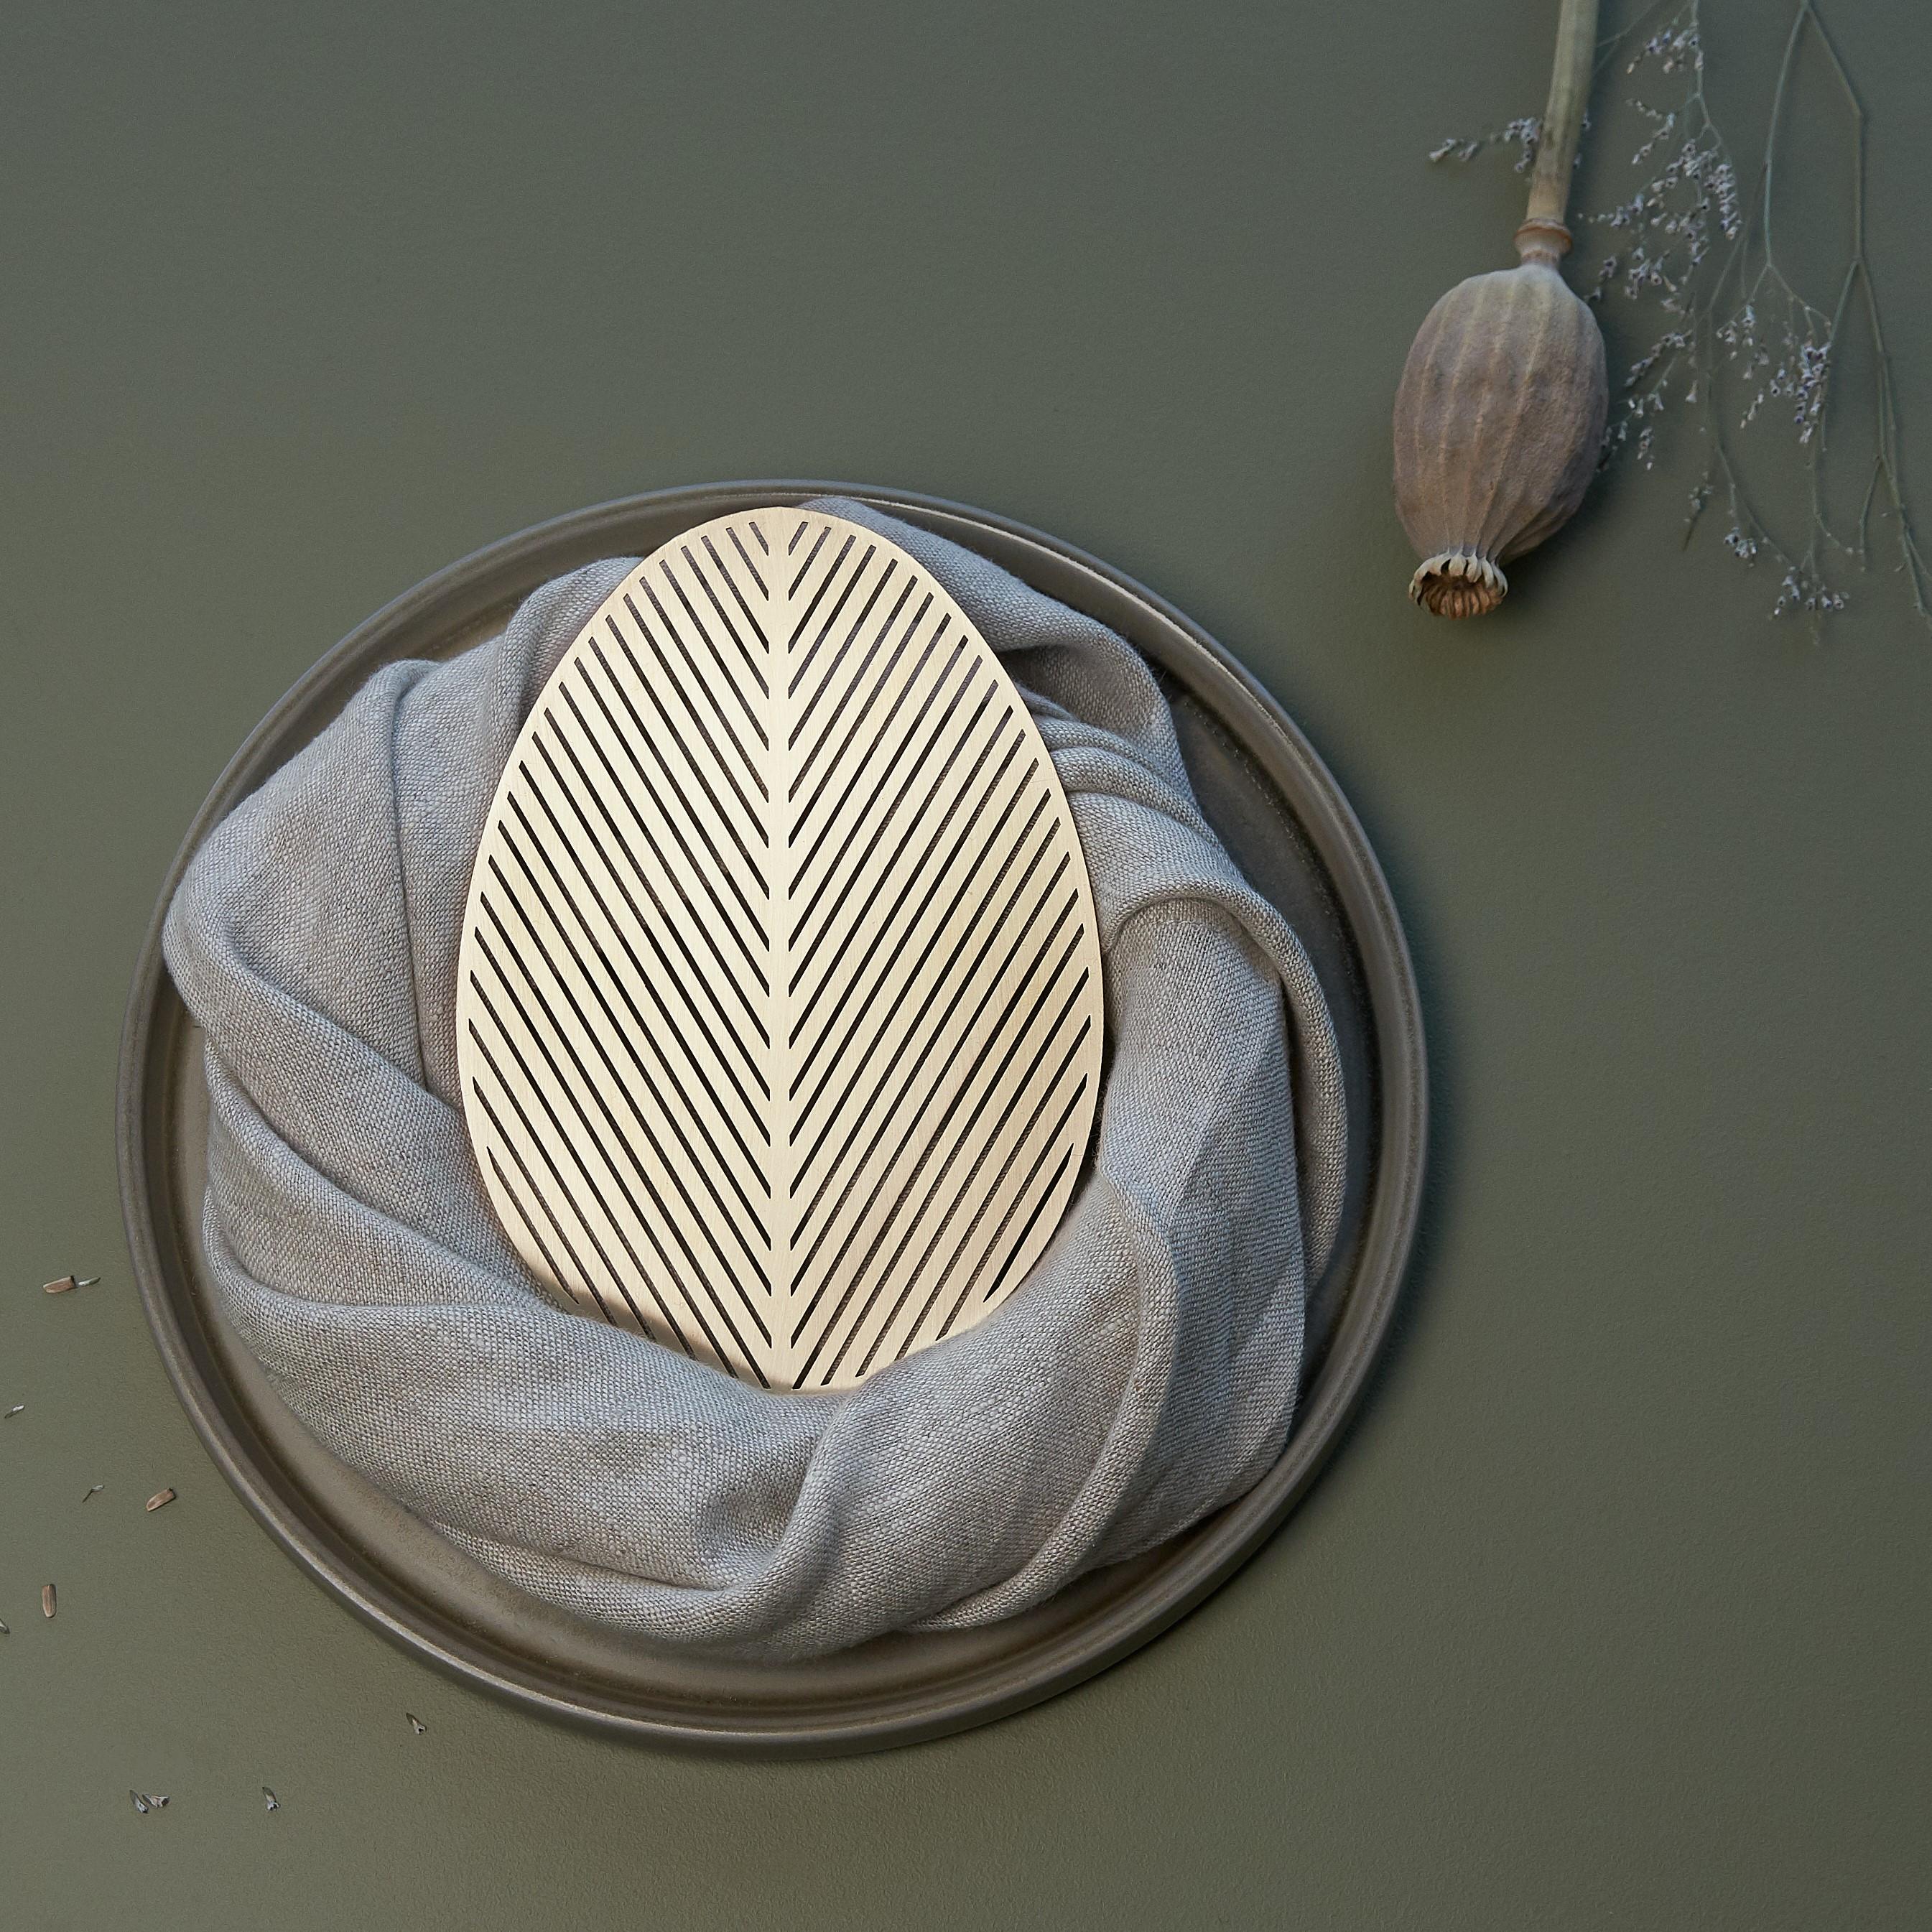 Brass-coaster-PALME-table-decor-Namuos